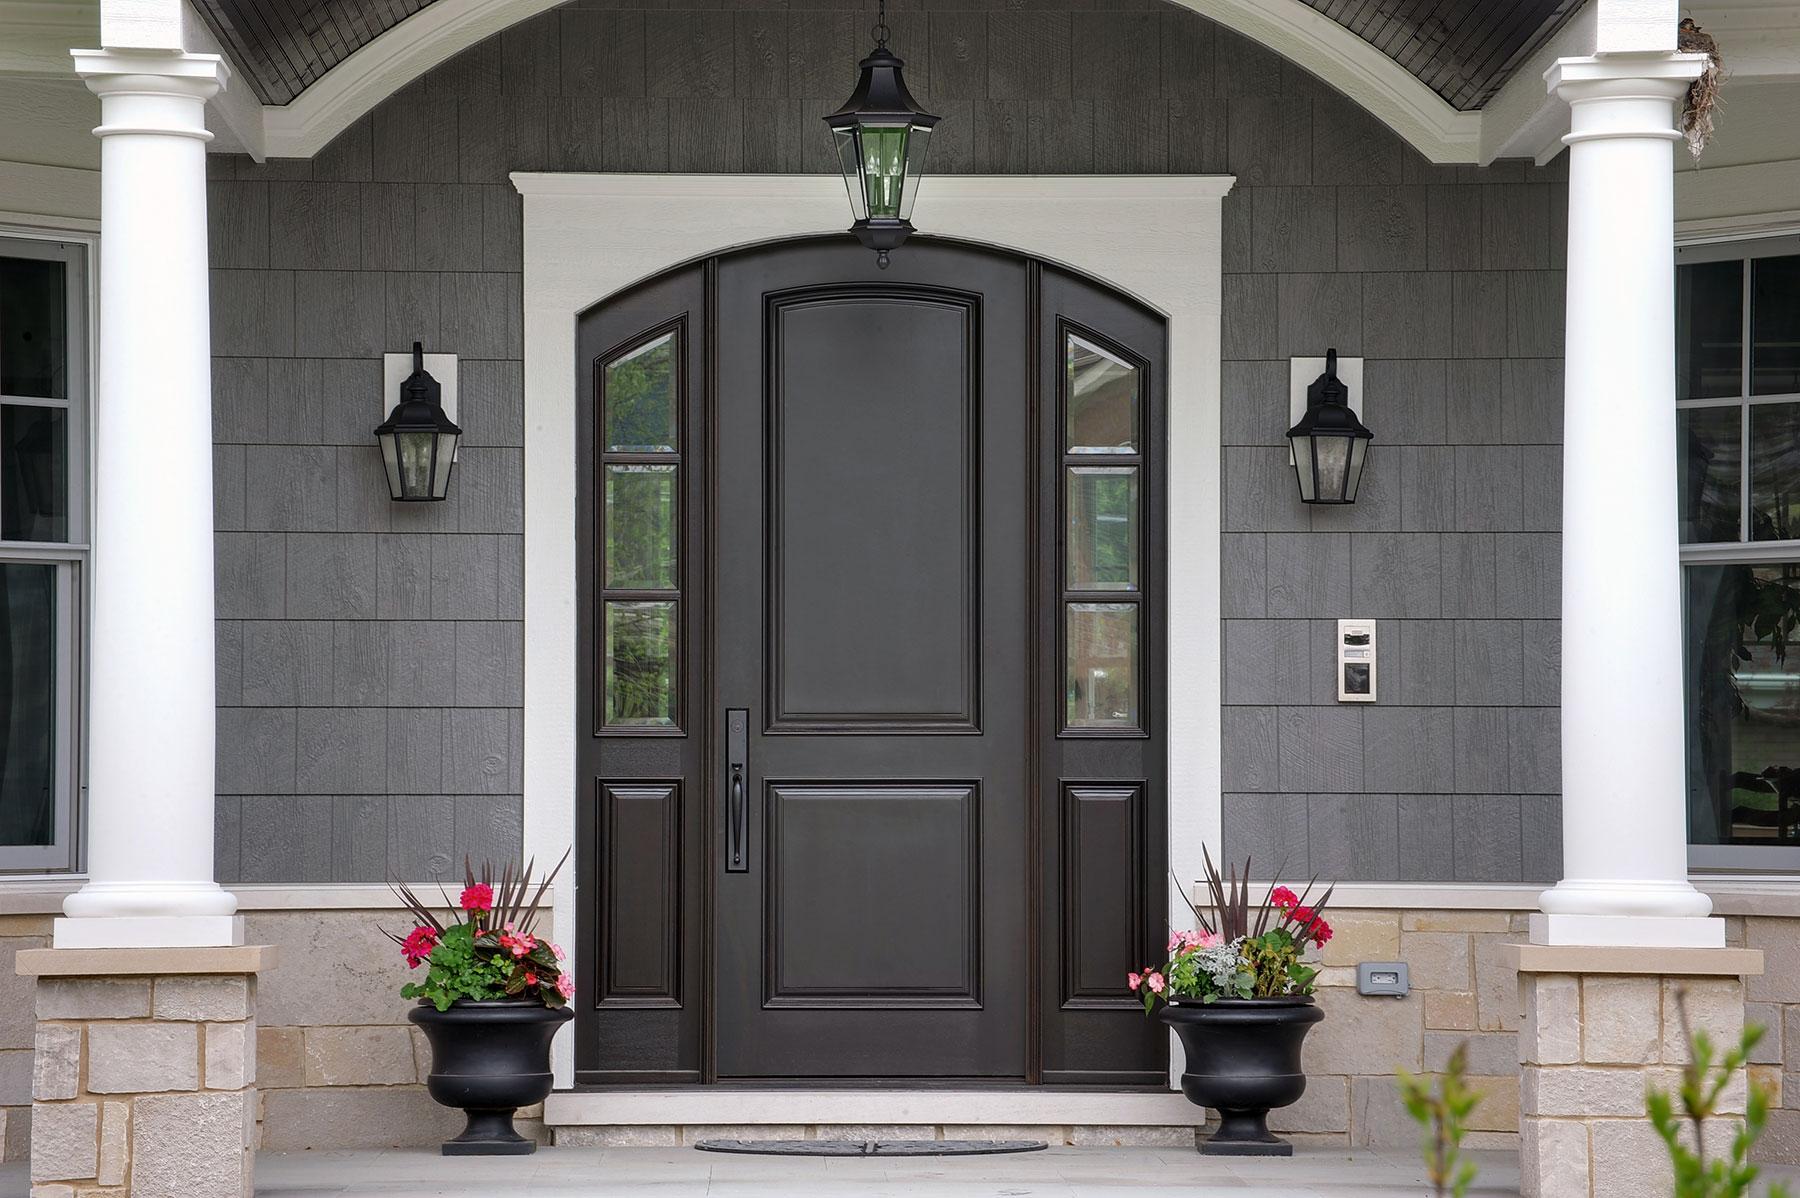 Custom Wood Front Entry Doors | solid wood front entry door with sidelites, classic style  - Glenview Doors - Custom Doors in Chicago